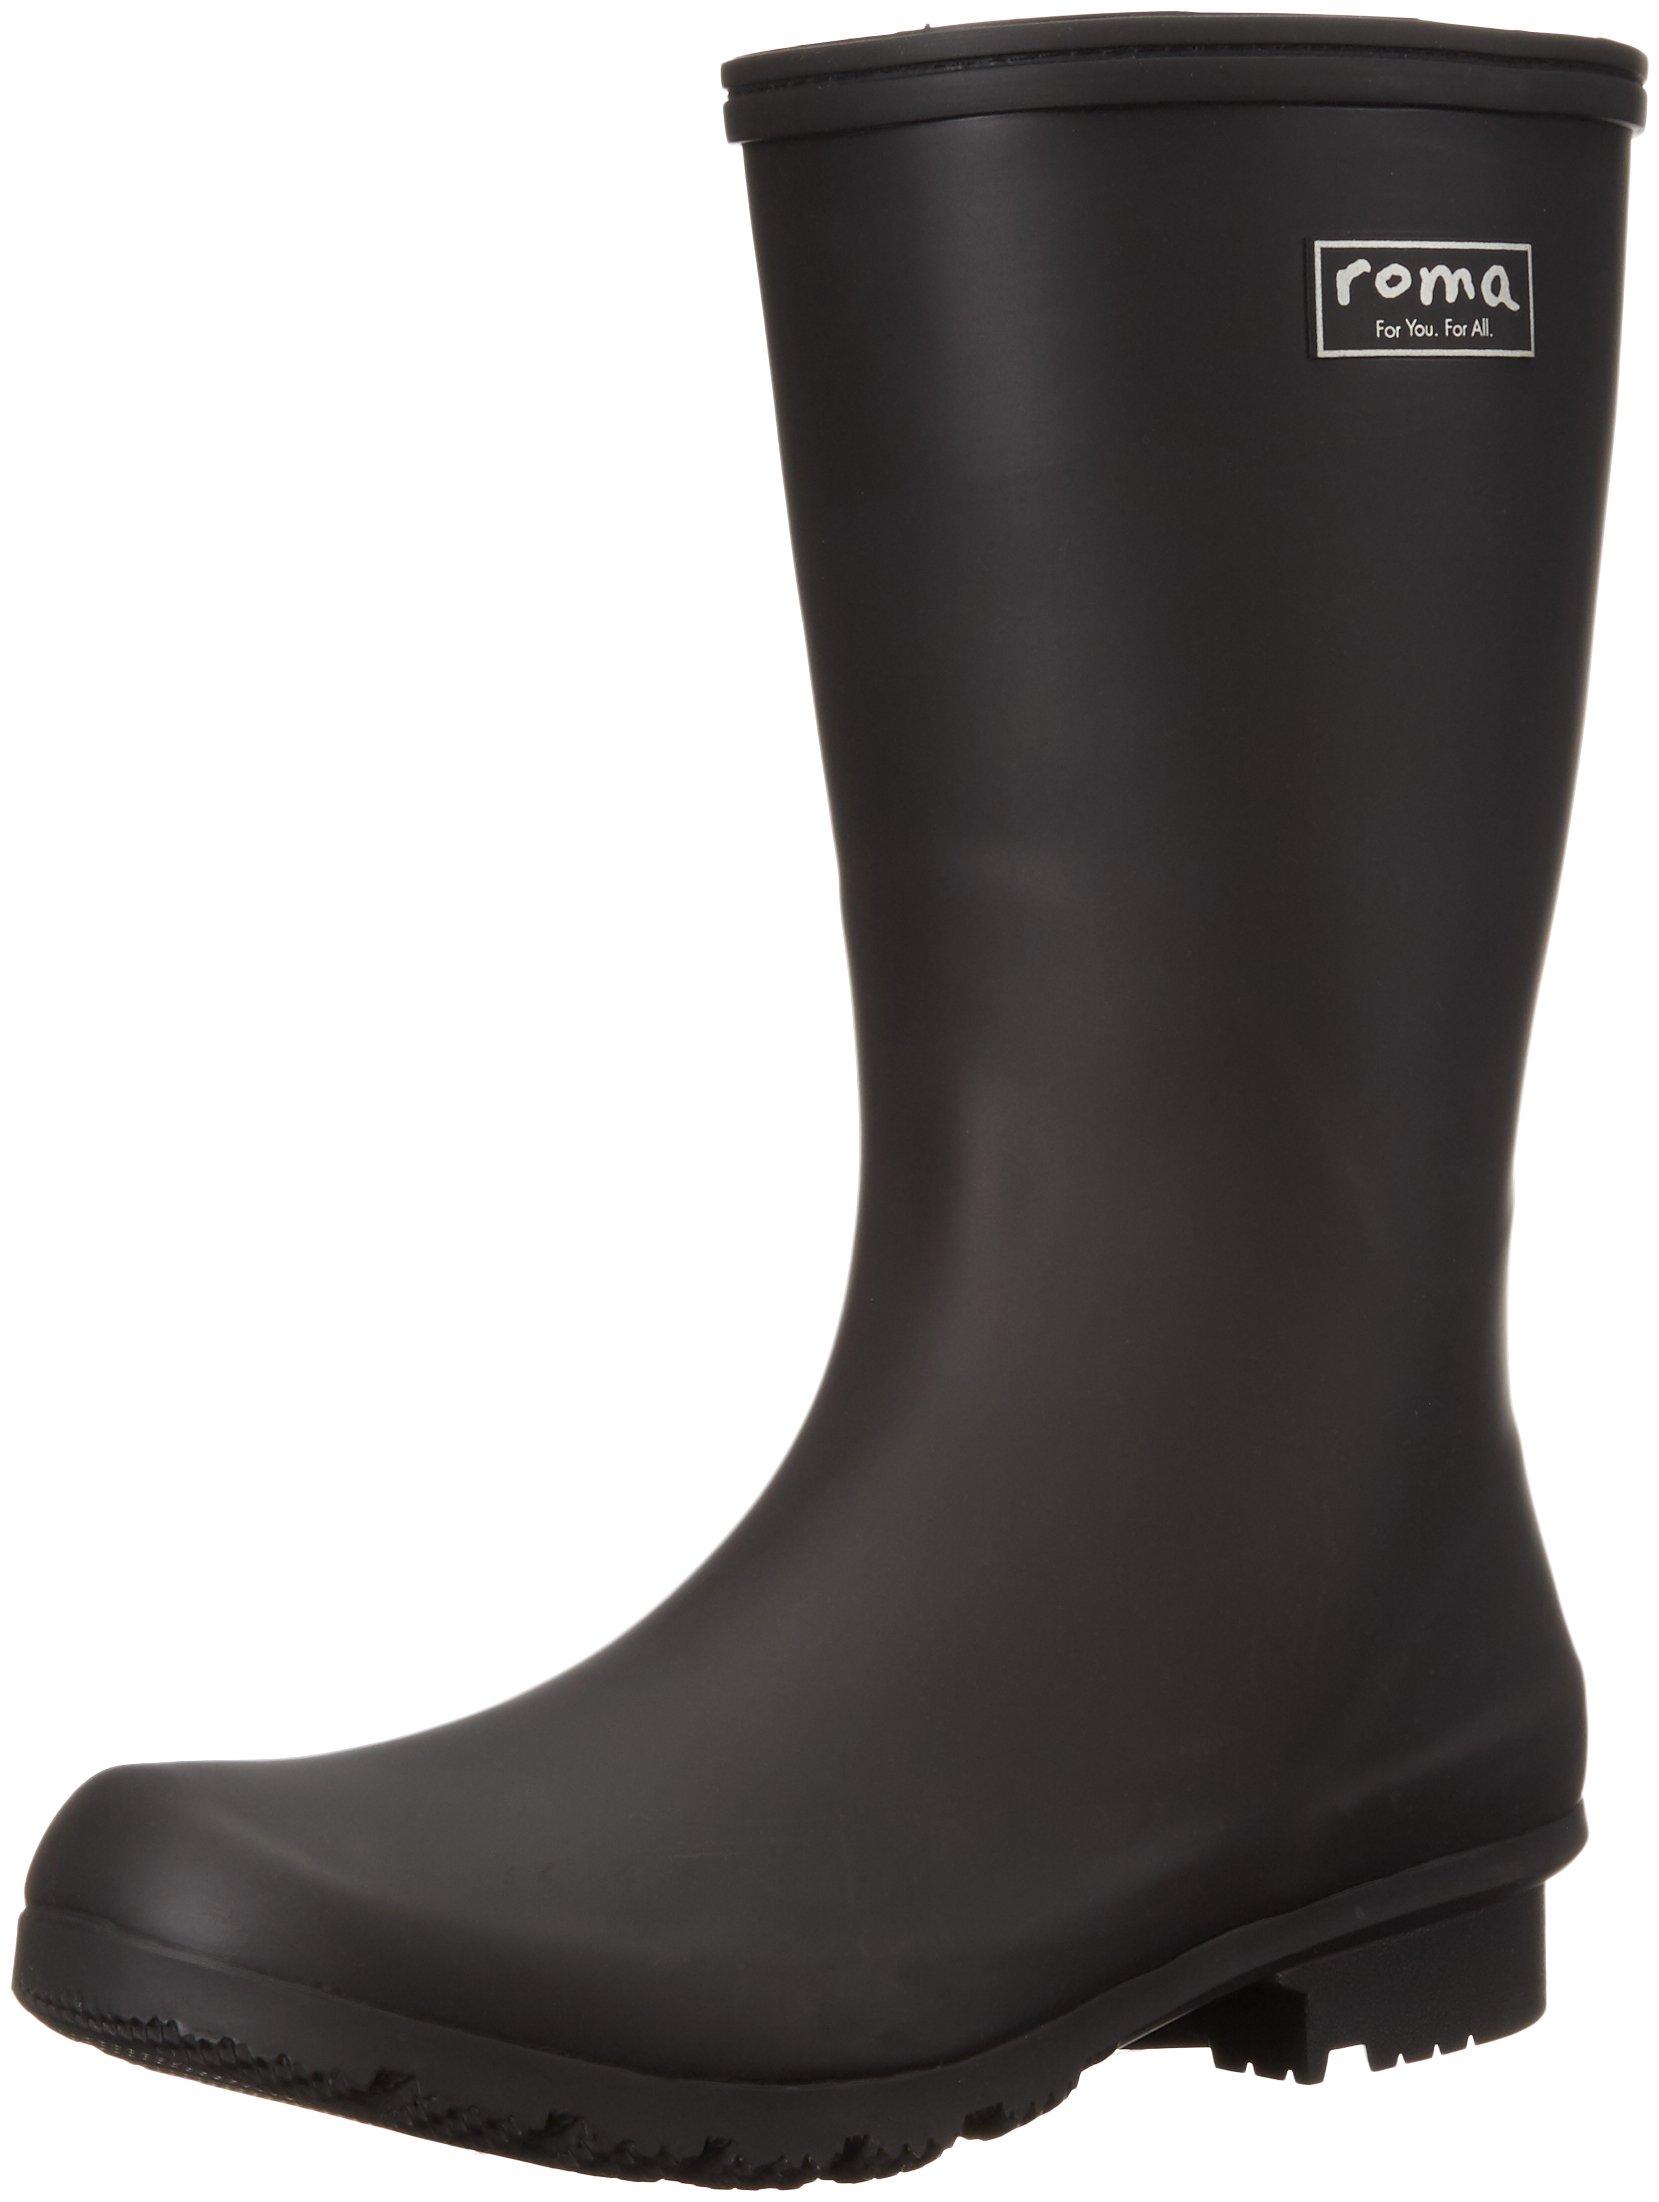 Roma Boots Women's EMMA Mid Rain Boots, Matte Black, 9 M US